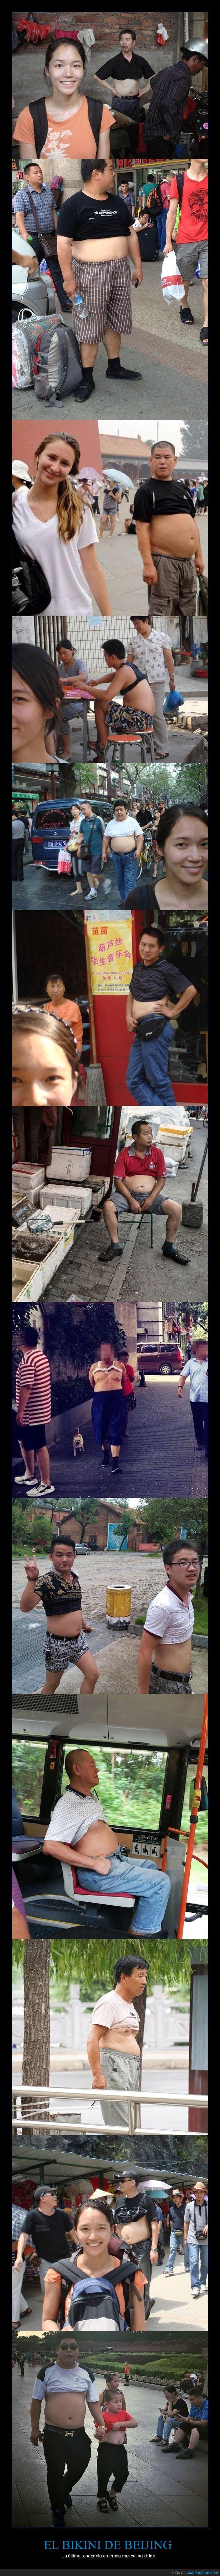 bikini de beijing,camiseta,chinos,tendencias